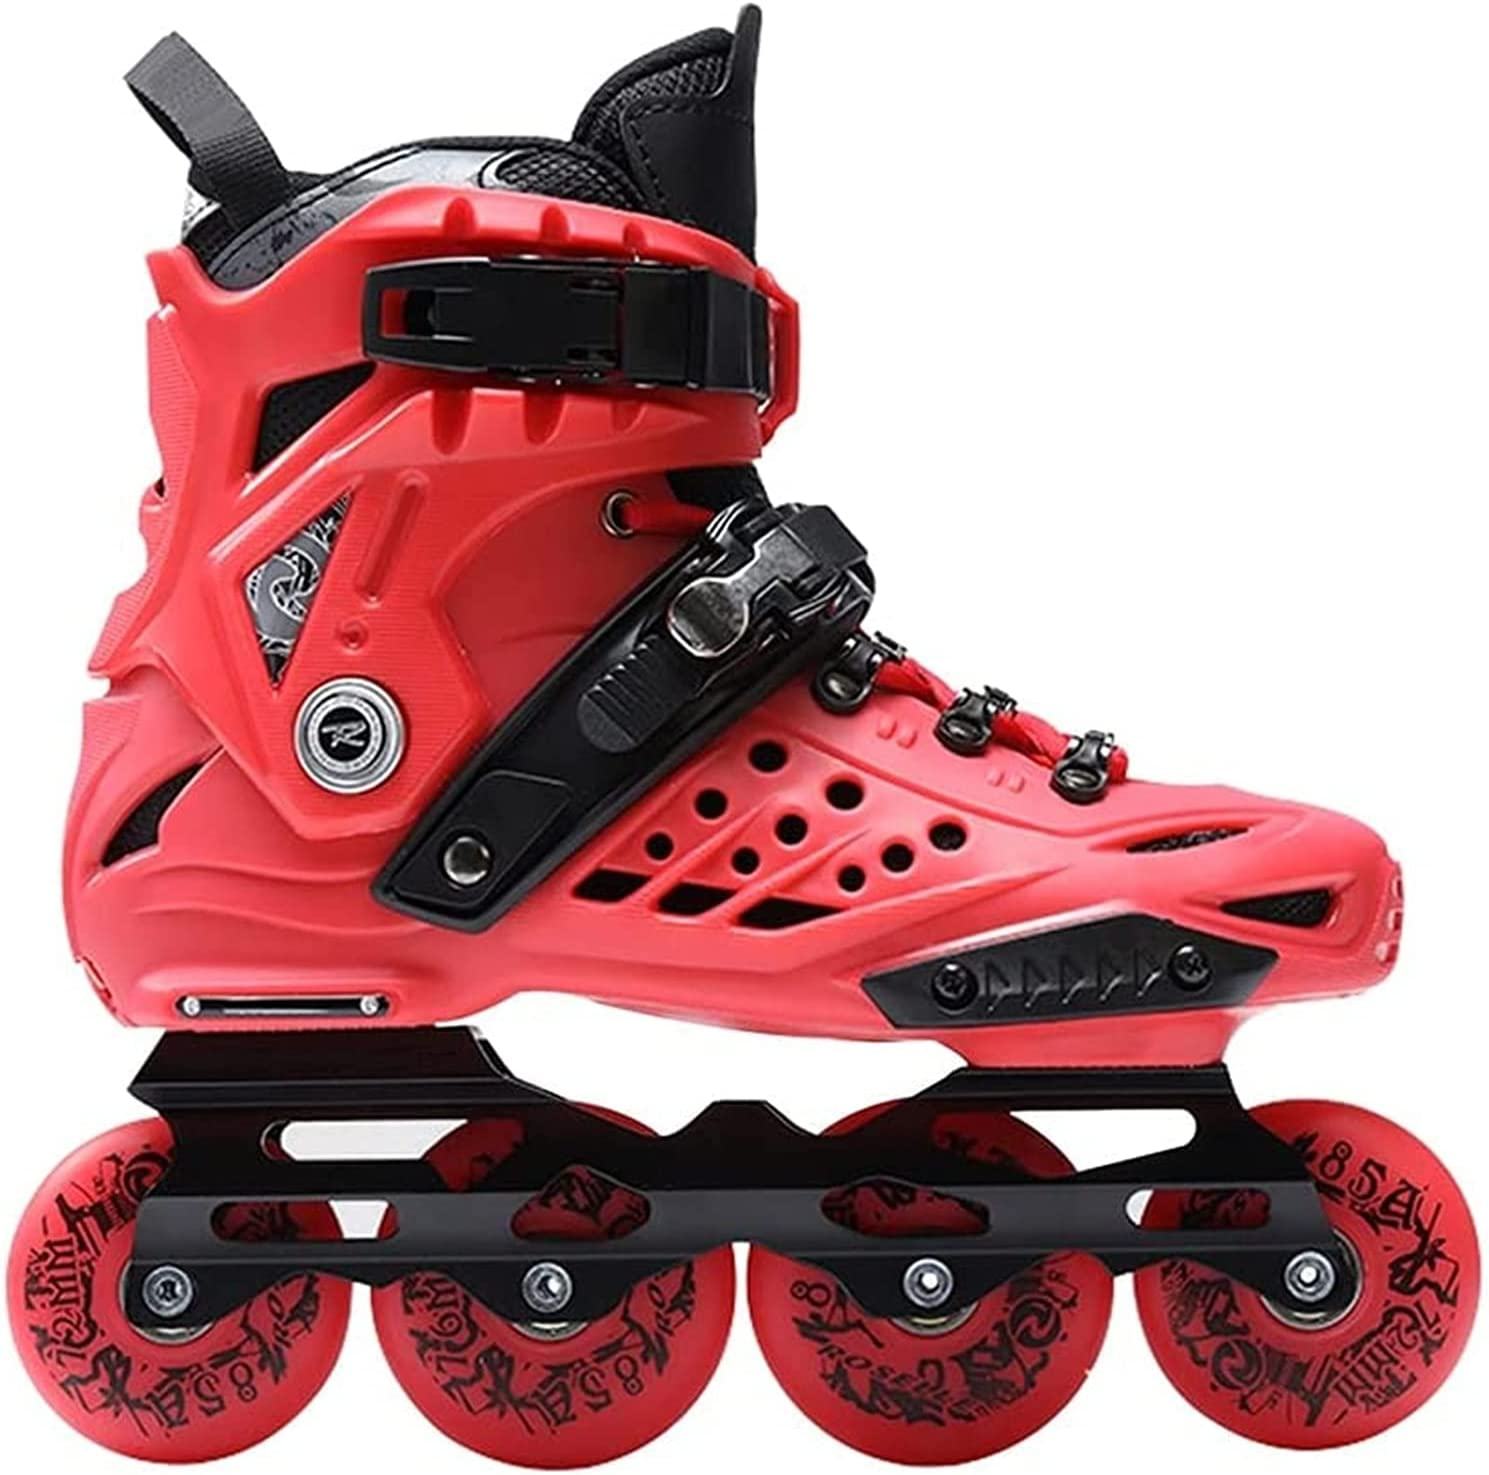 Overseas parallel import regular item CAIFENG Inline Skates Adult Fitness O Roller for Beginner Regular store